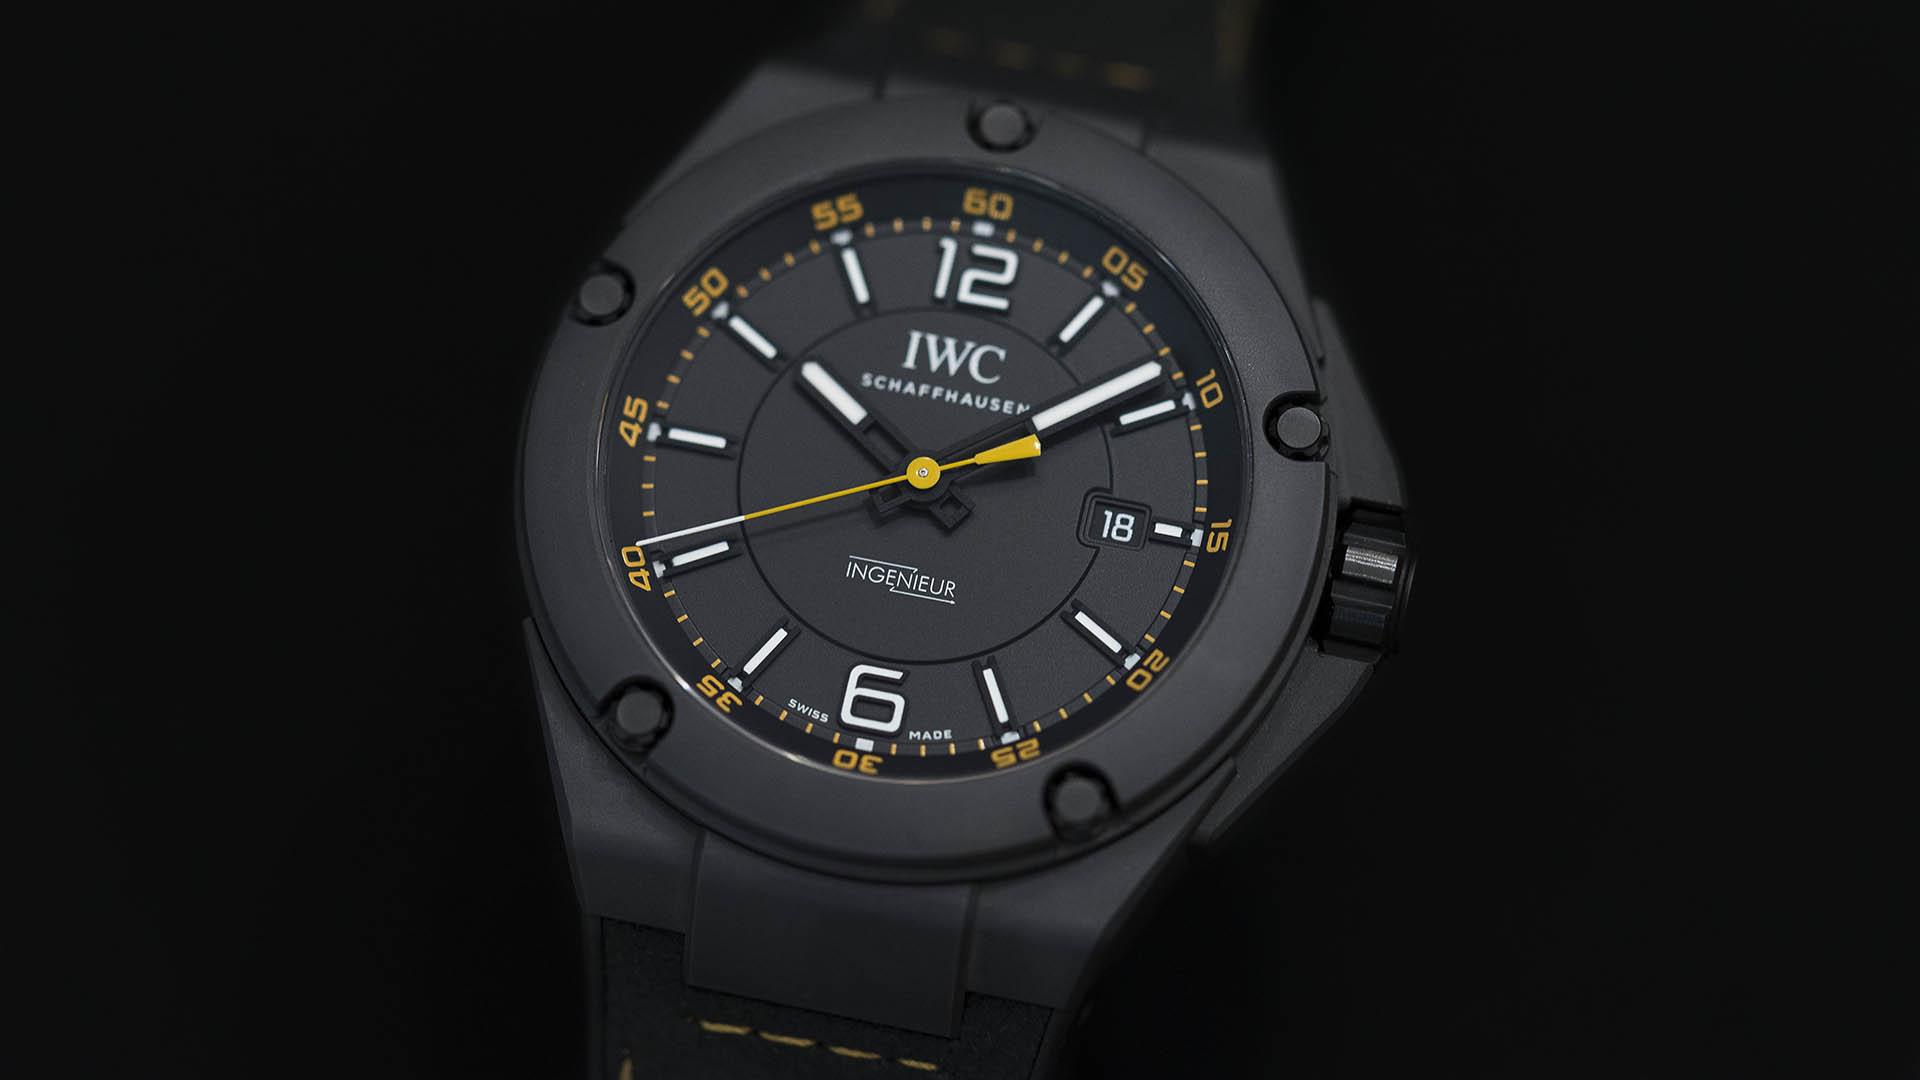 -WC_-ngenieur_Automatic_AMG_GT_Edition_-W324602_Boron_Carbide_12s.jpg